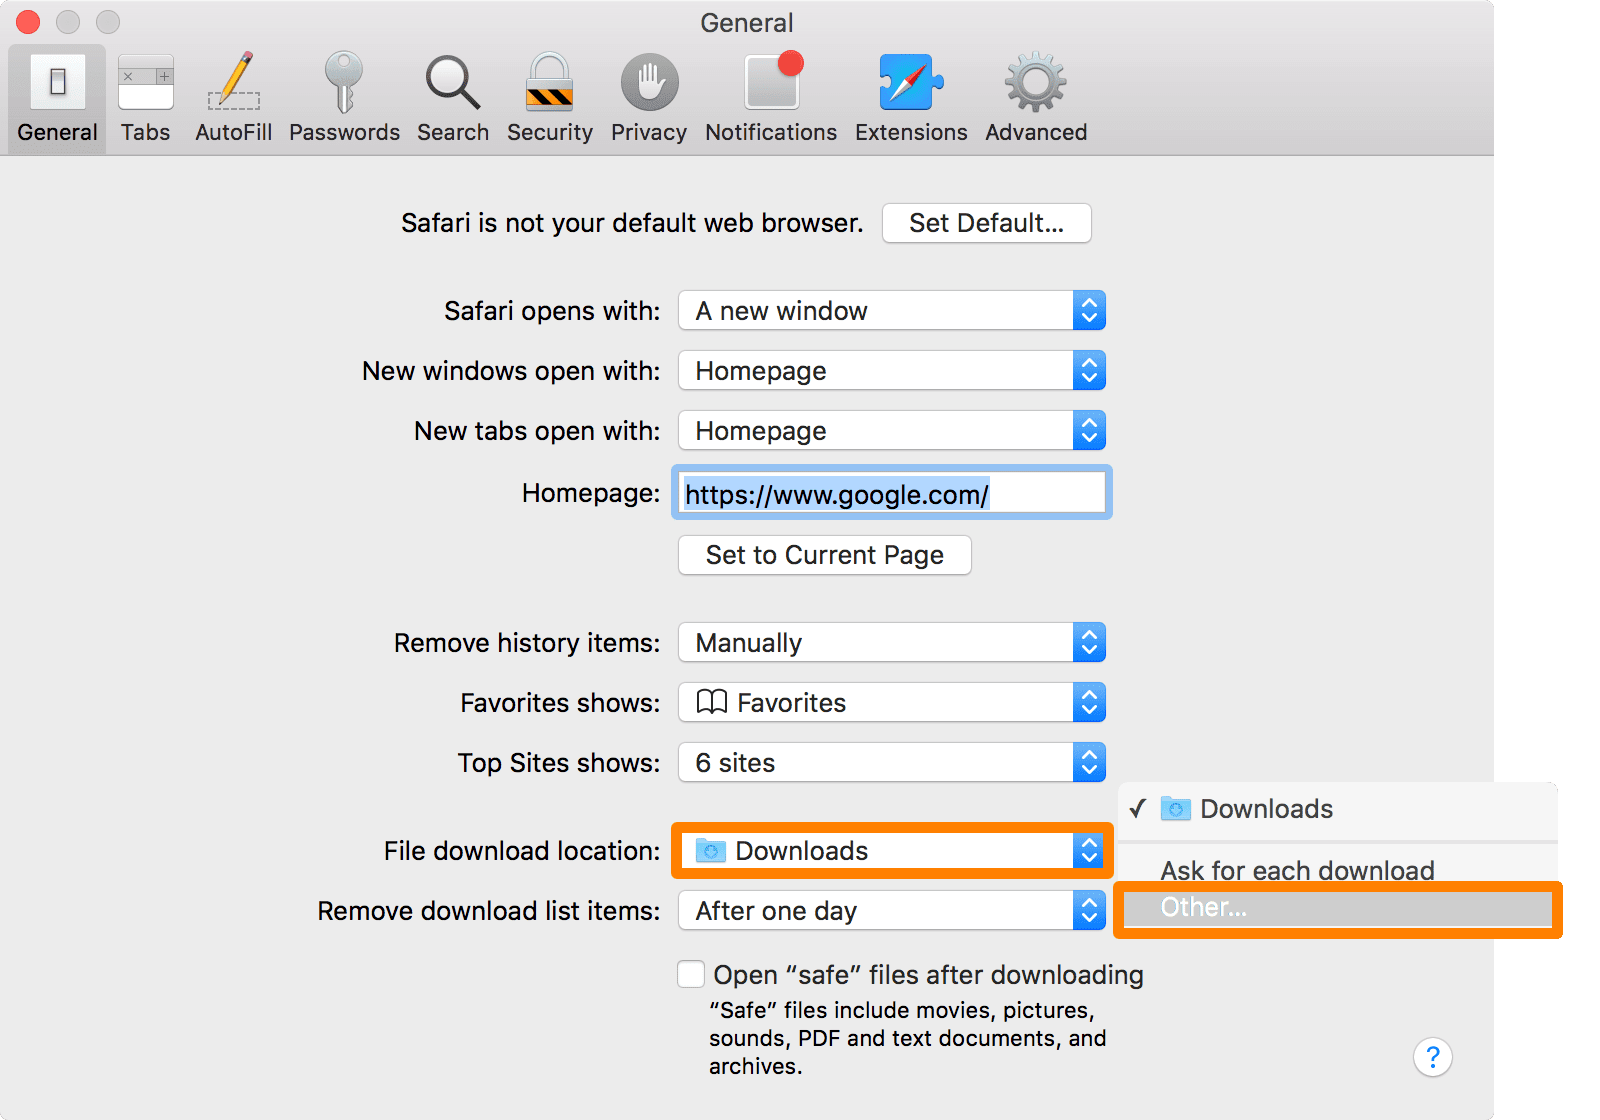 Safari Downloads Location Other